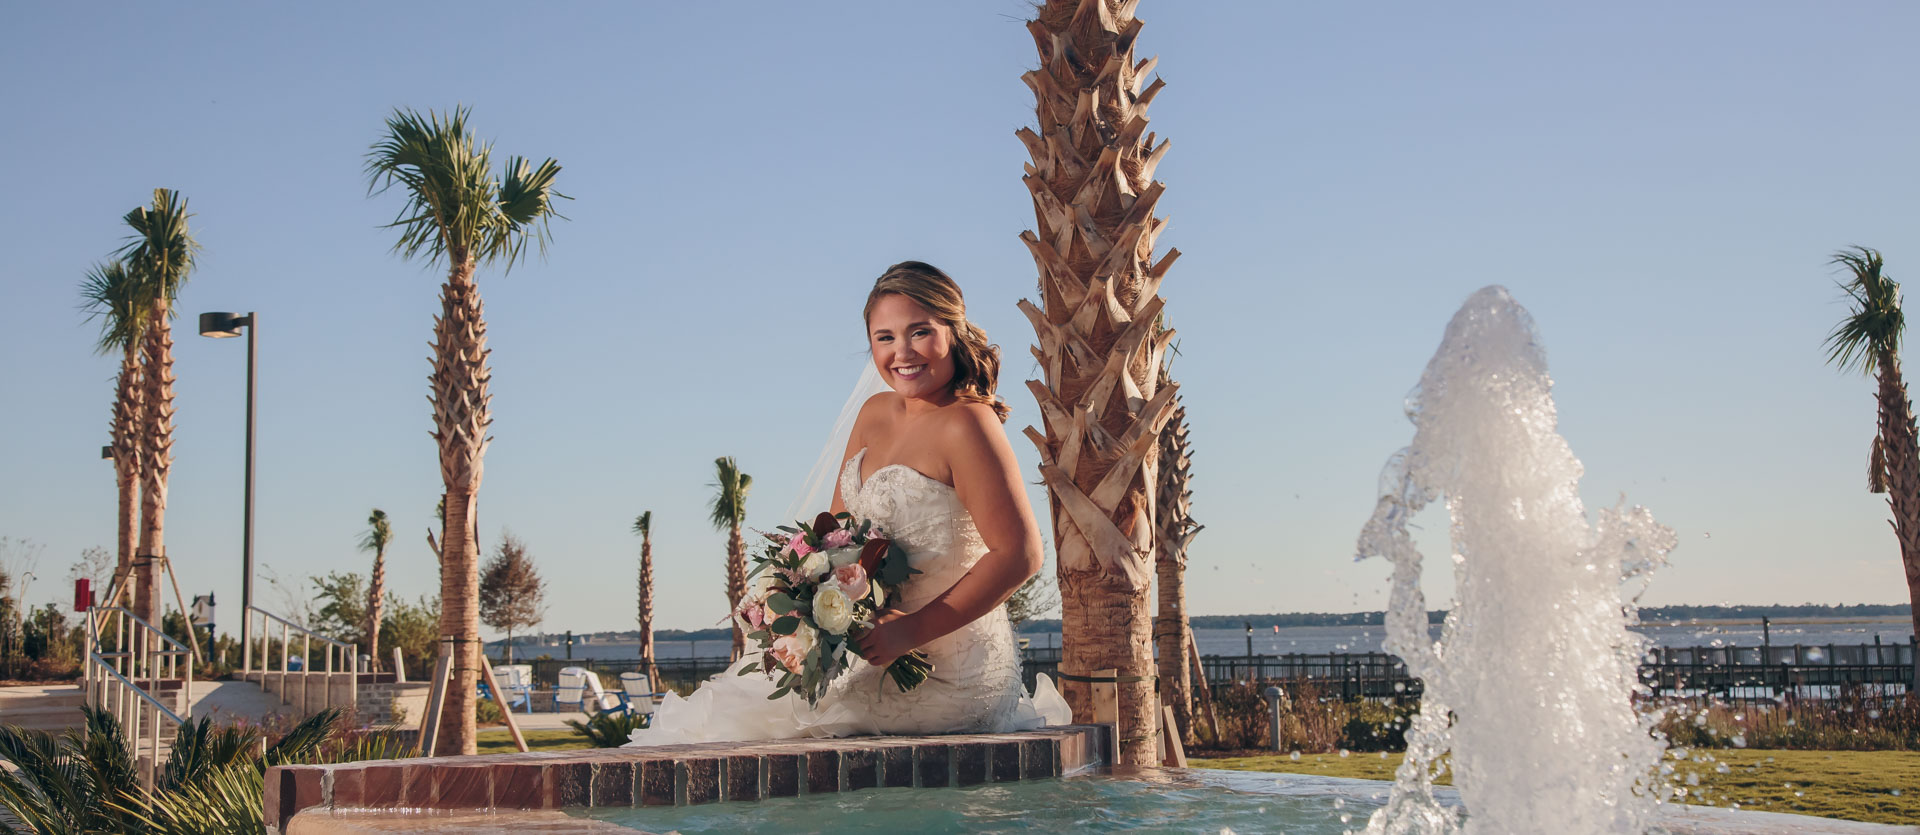 natalie-the-bride